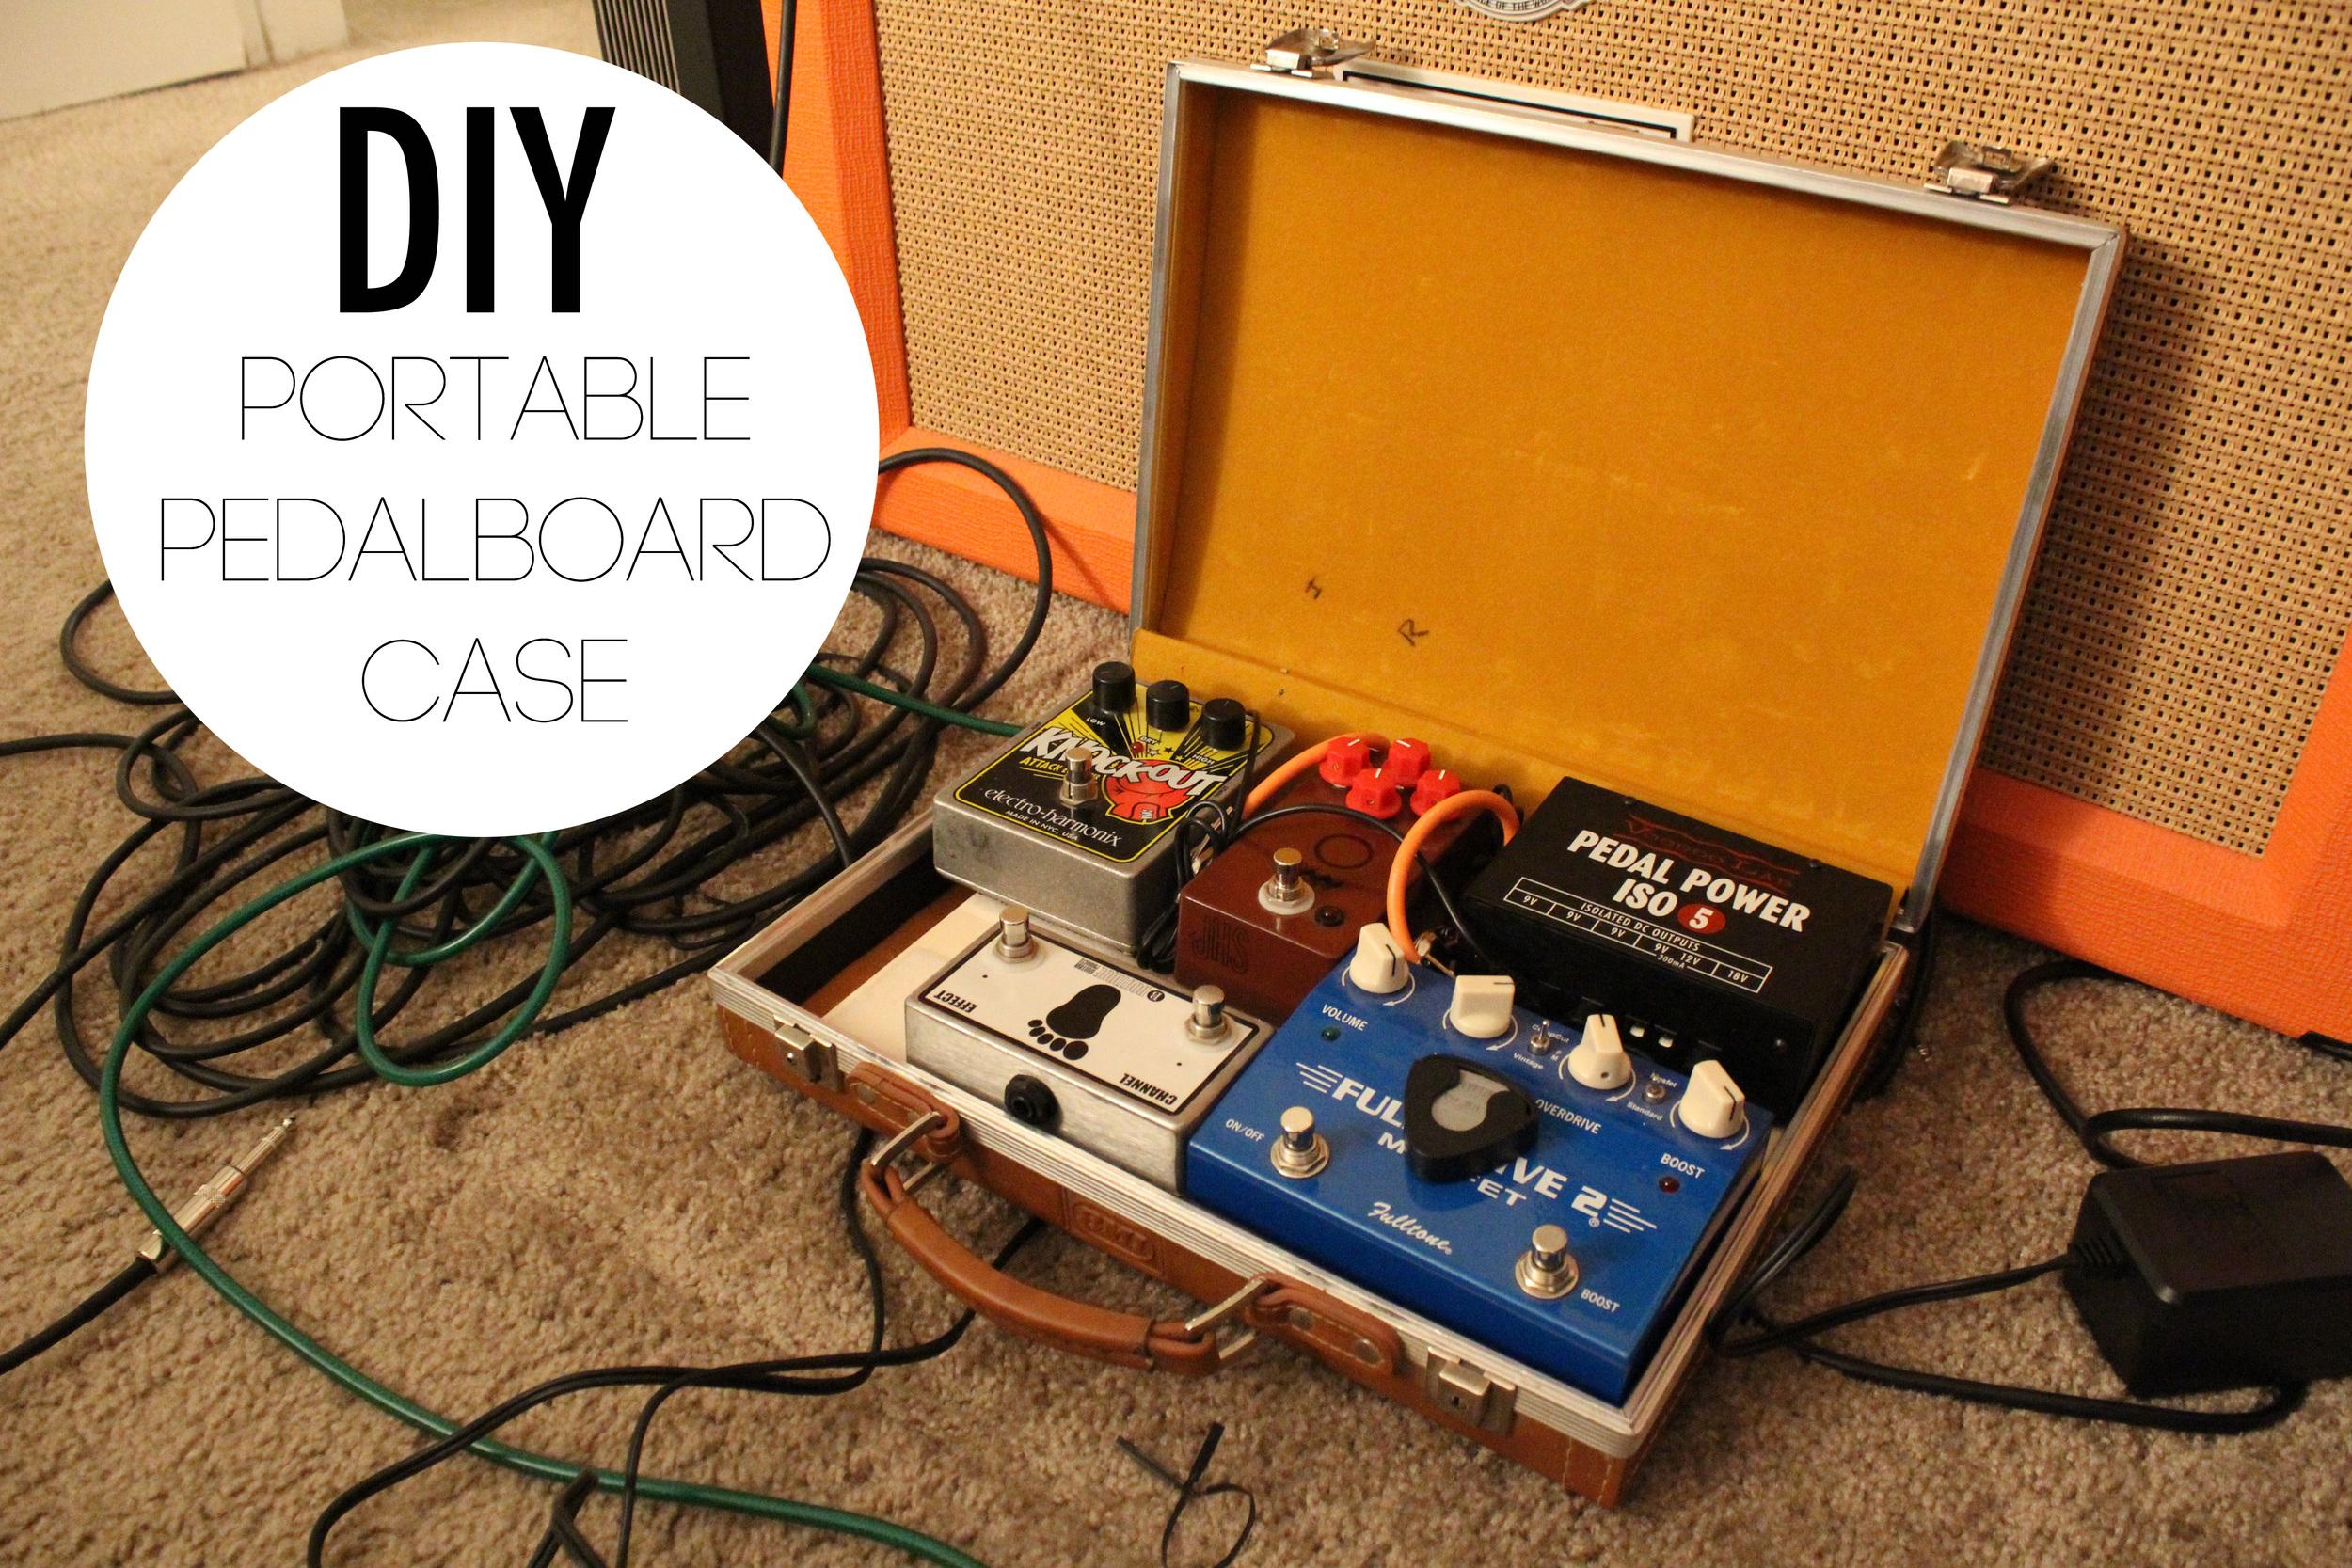 diy portable pedalboard case paige poppe. Black Bedroom Furniture Sets. Home Design Ideas